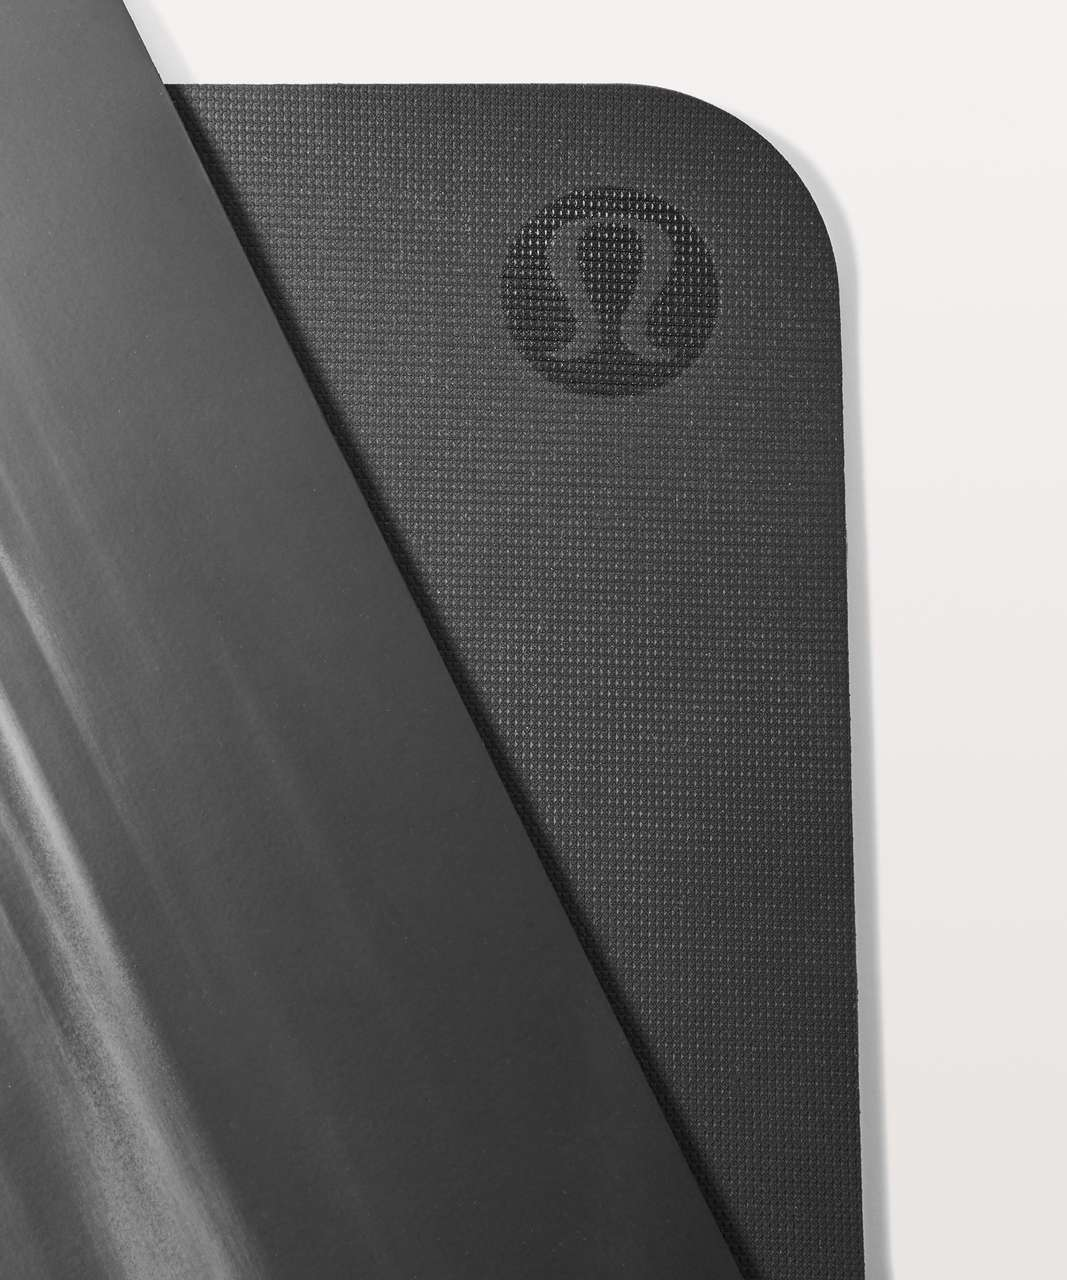 Lululemon The Reversible Mat 5mm *Expression - Black / White / Black